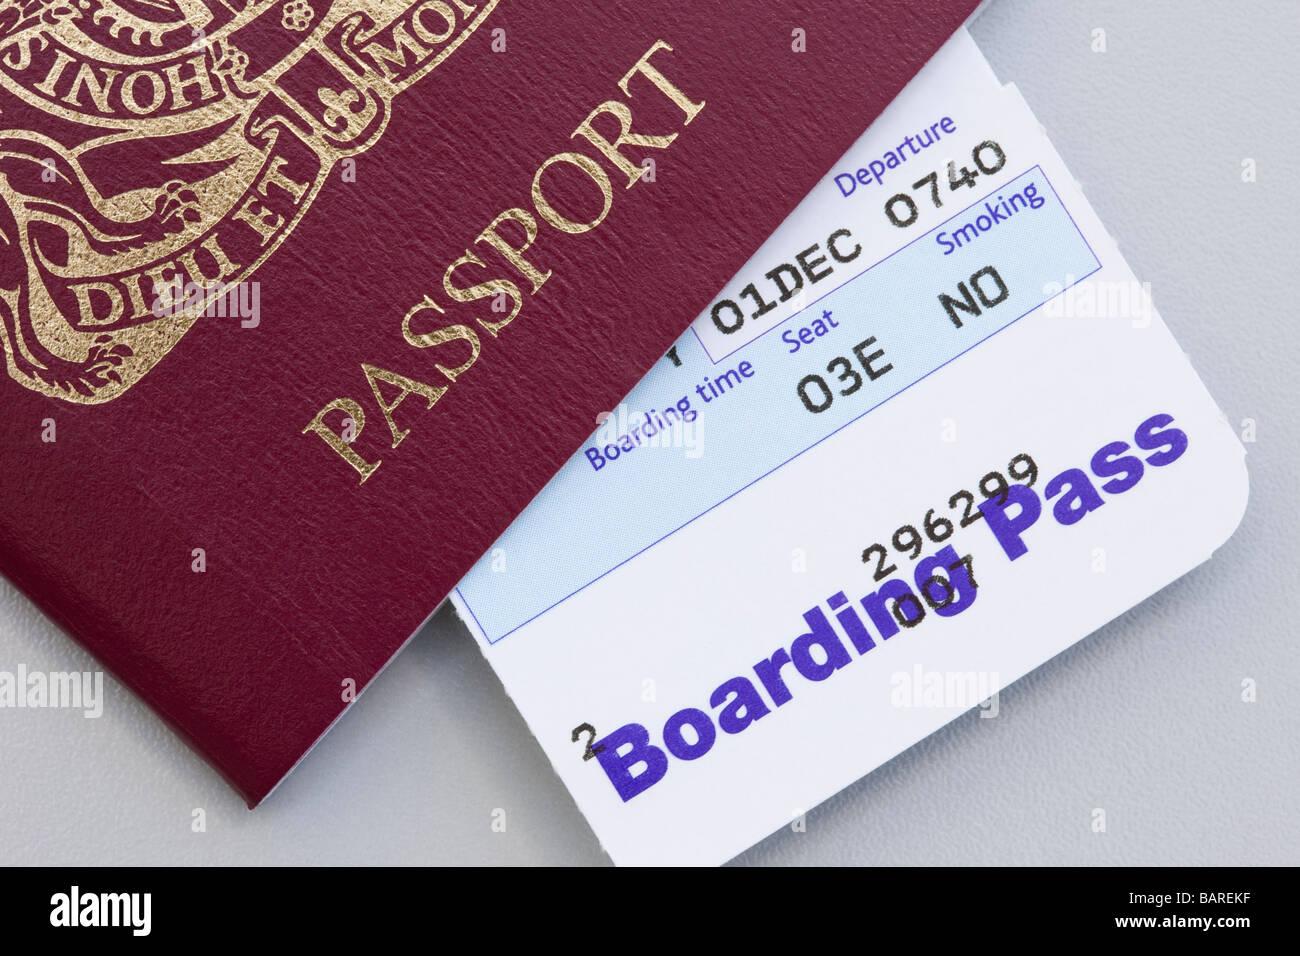 United Kingdom British passport with plane flight Boarding Pass  for travel abroad - Stock Image